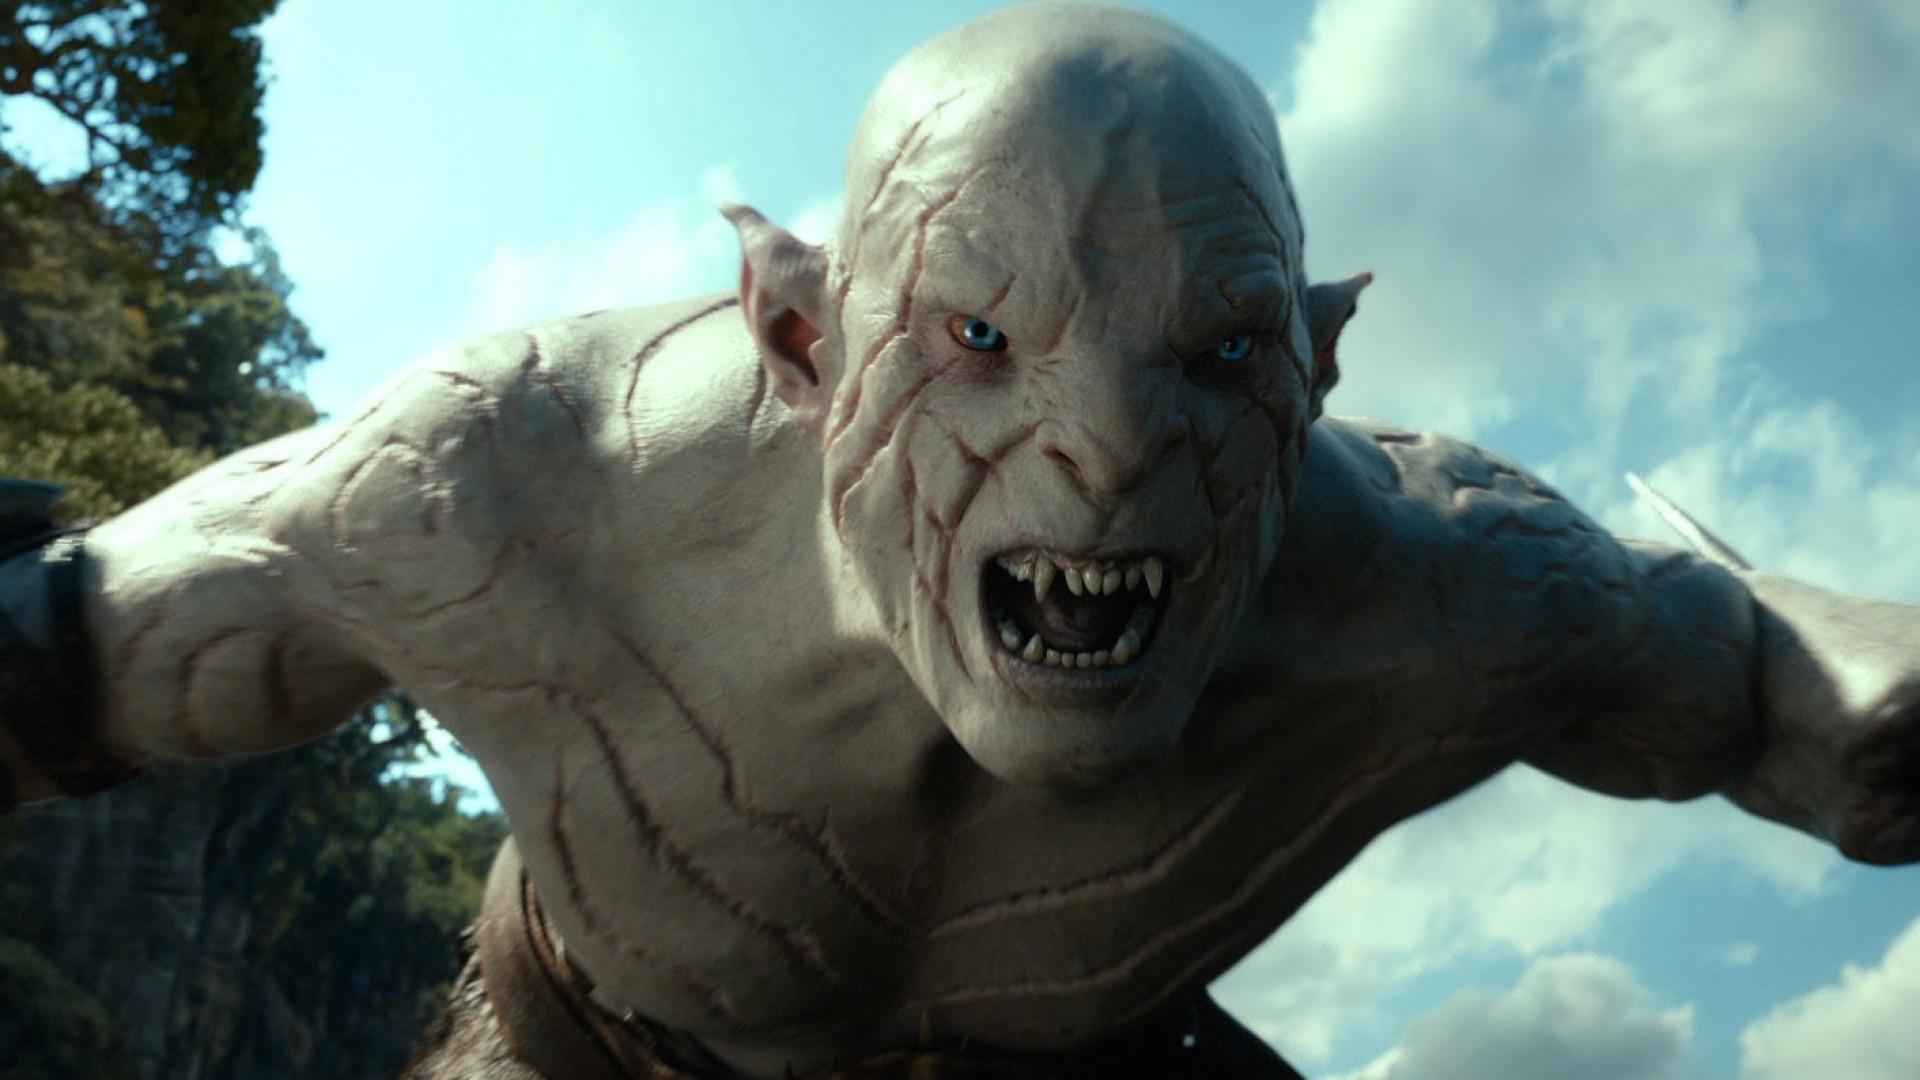 The Hobbit the Desolation of Smaug wallpaper 3